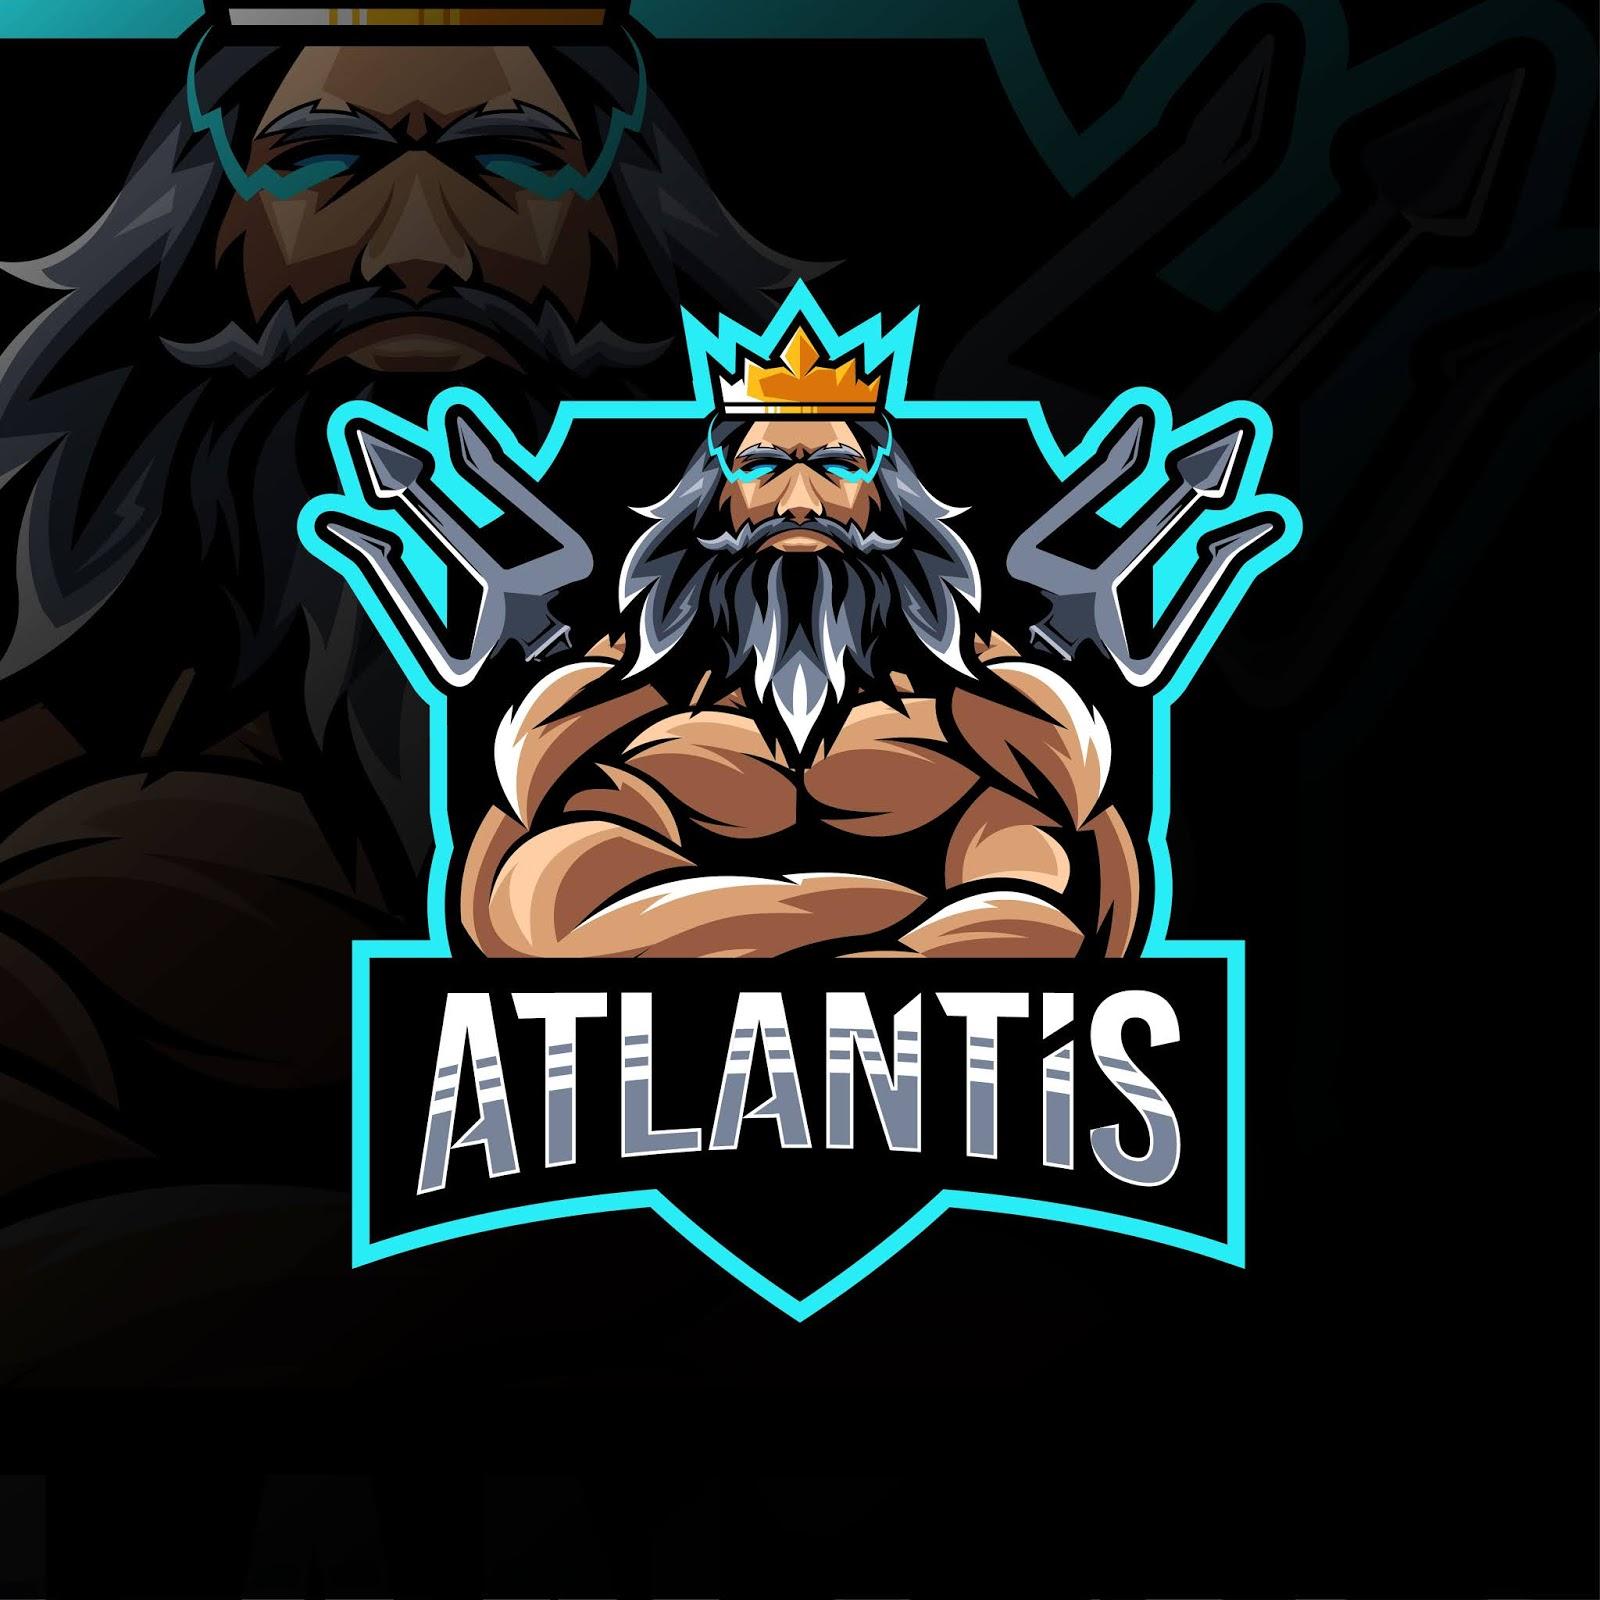 Atlantis Mascot Logo Esport Template Free Download Vector CDR, AI, EPS and PNG Formats